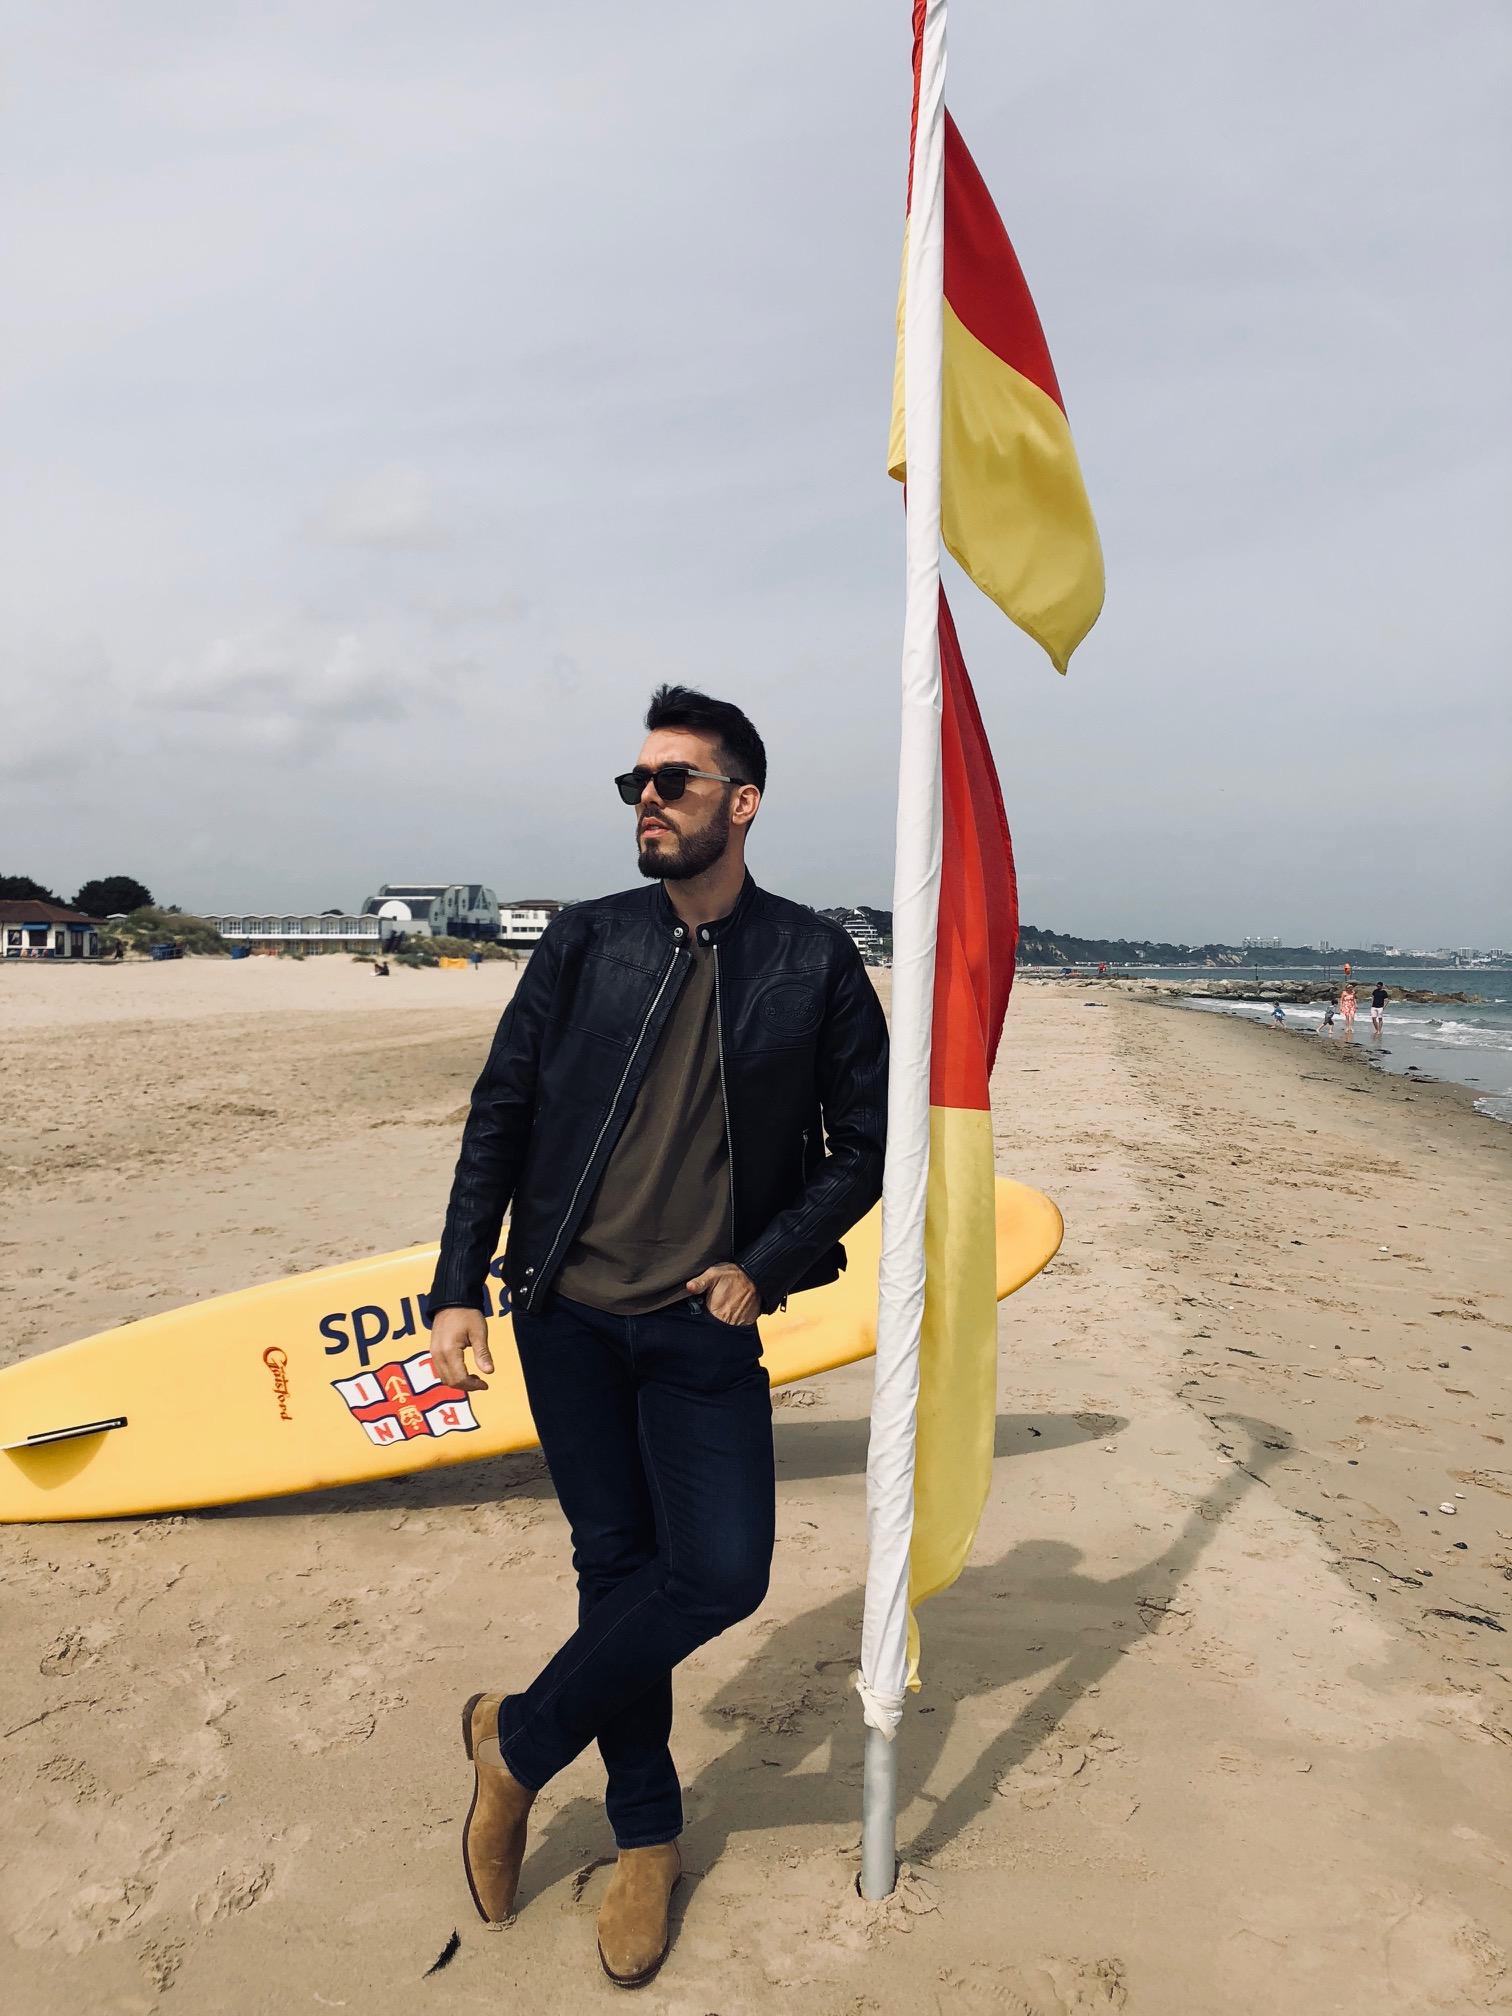 Leather Jacket: Diesel / Sunglasses: Saint Laurent